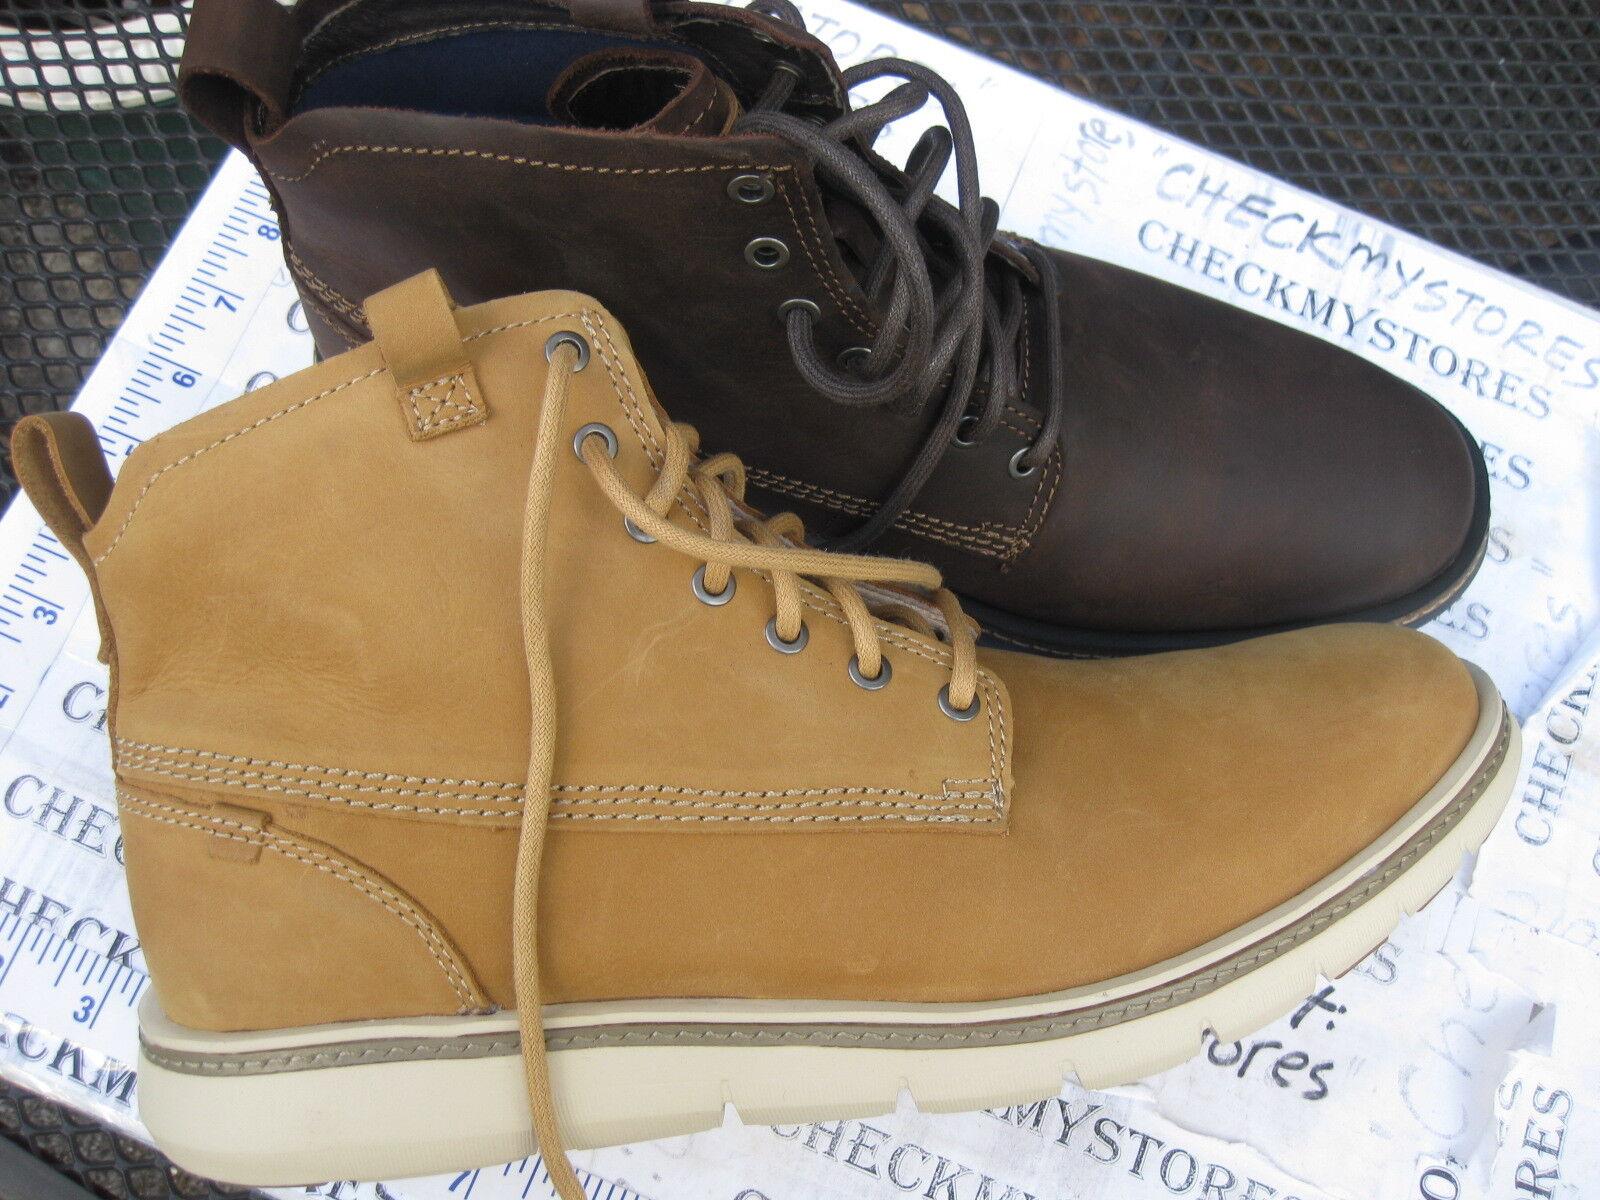 NEW Mark Nason by Skechers 68191 Men's Crossover Chukka Boot MULTI SIZES/COLORS